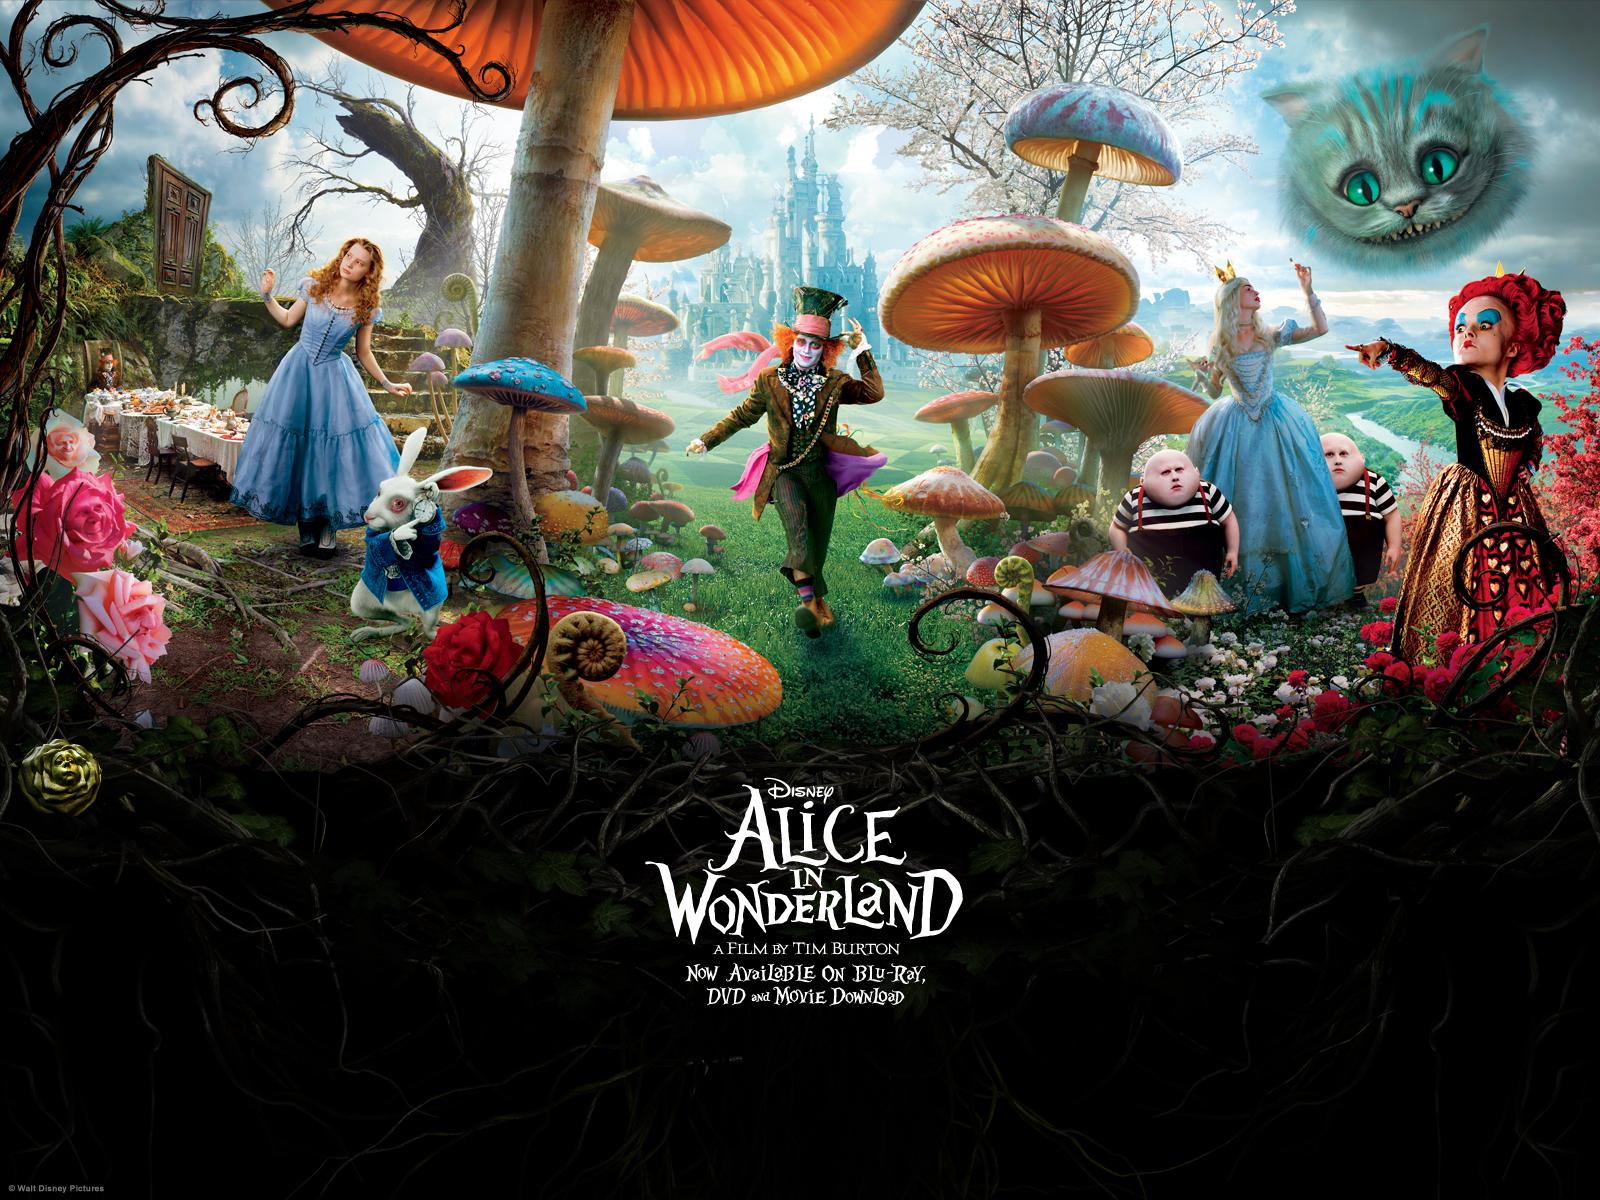 http://4.bp.blogspot.com/_tjIuvPOybhI/TTZuAJnnGfI/AAAAAAAAAB8/V2CXI0_UpwI/s1600/Alice-in-Wonderland-alice-in-wonderland-2010-16559064-1600-1200.jpg